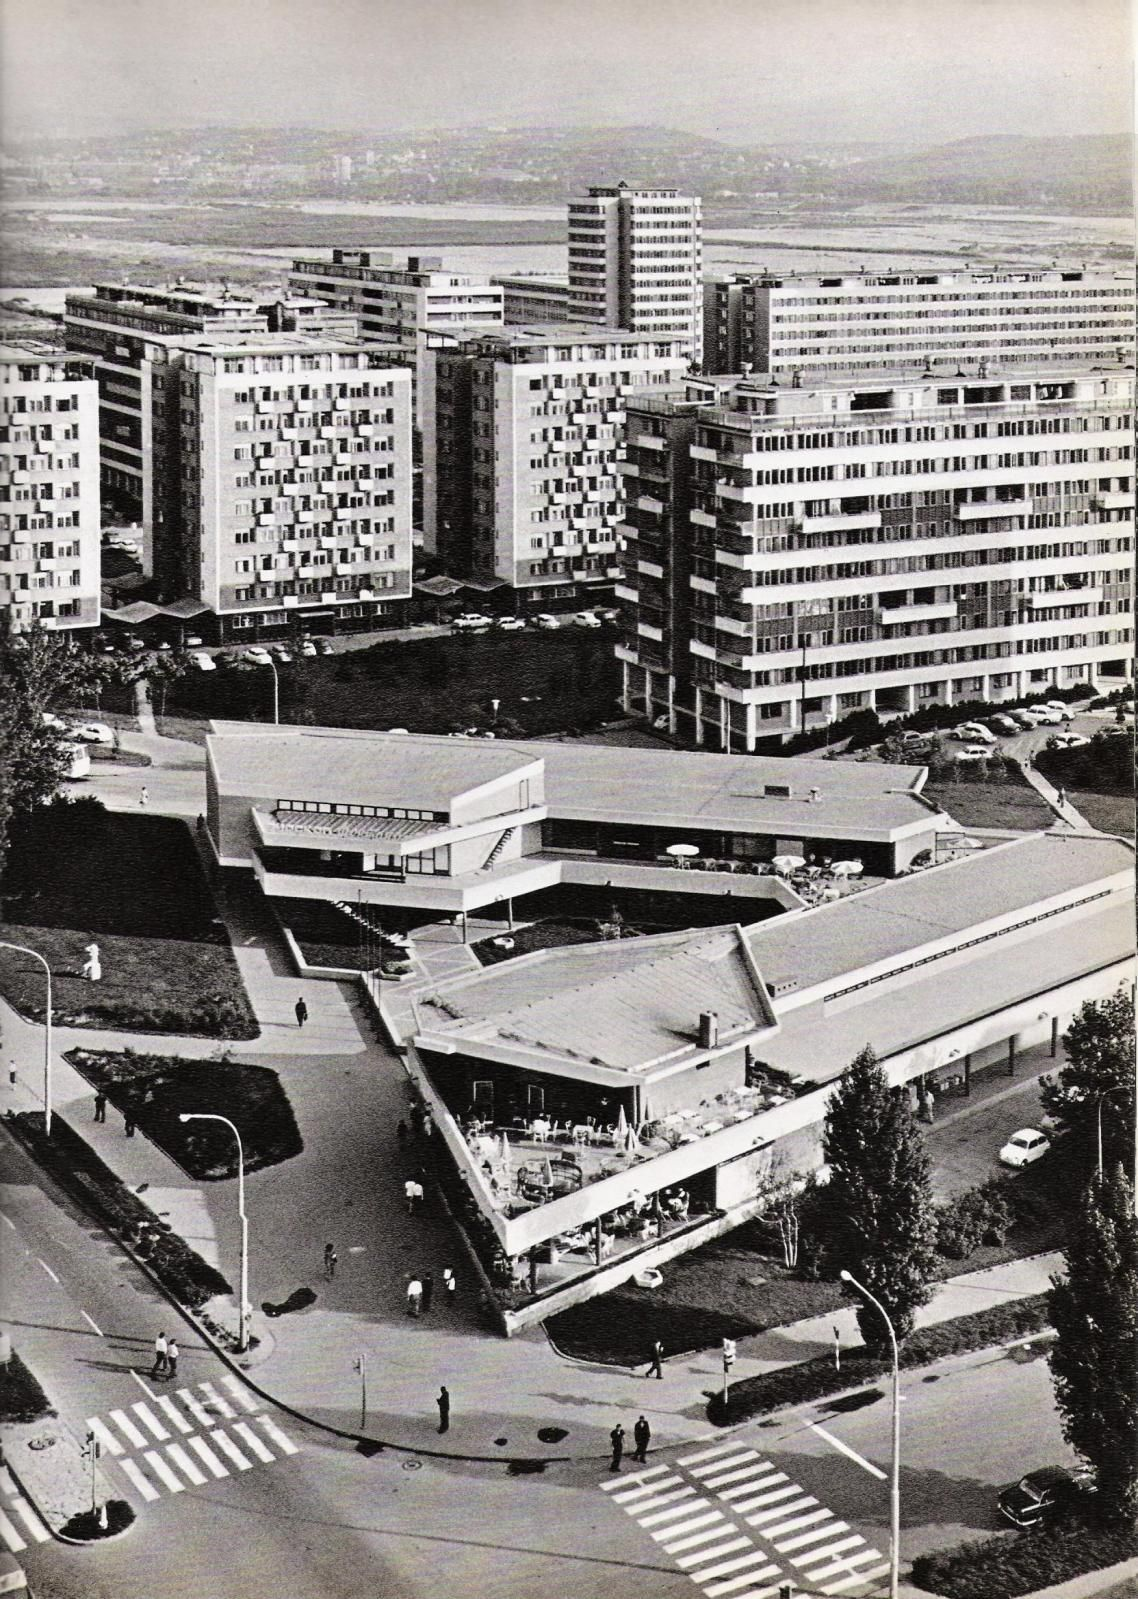 Jarun Tumblr Stalinist Architecture Landscape And Urbanism Art And Architecture